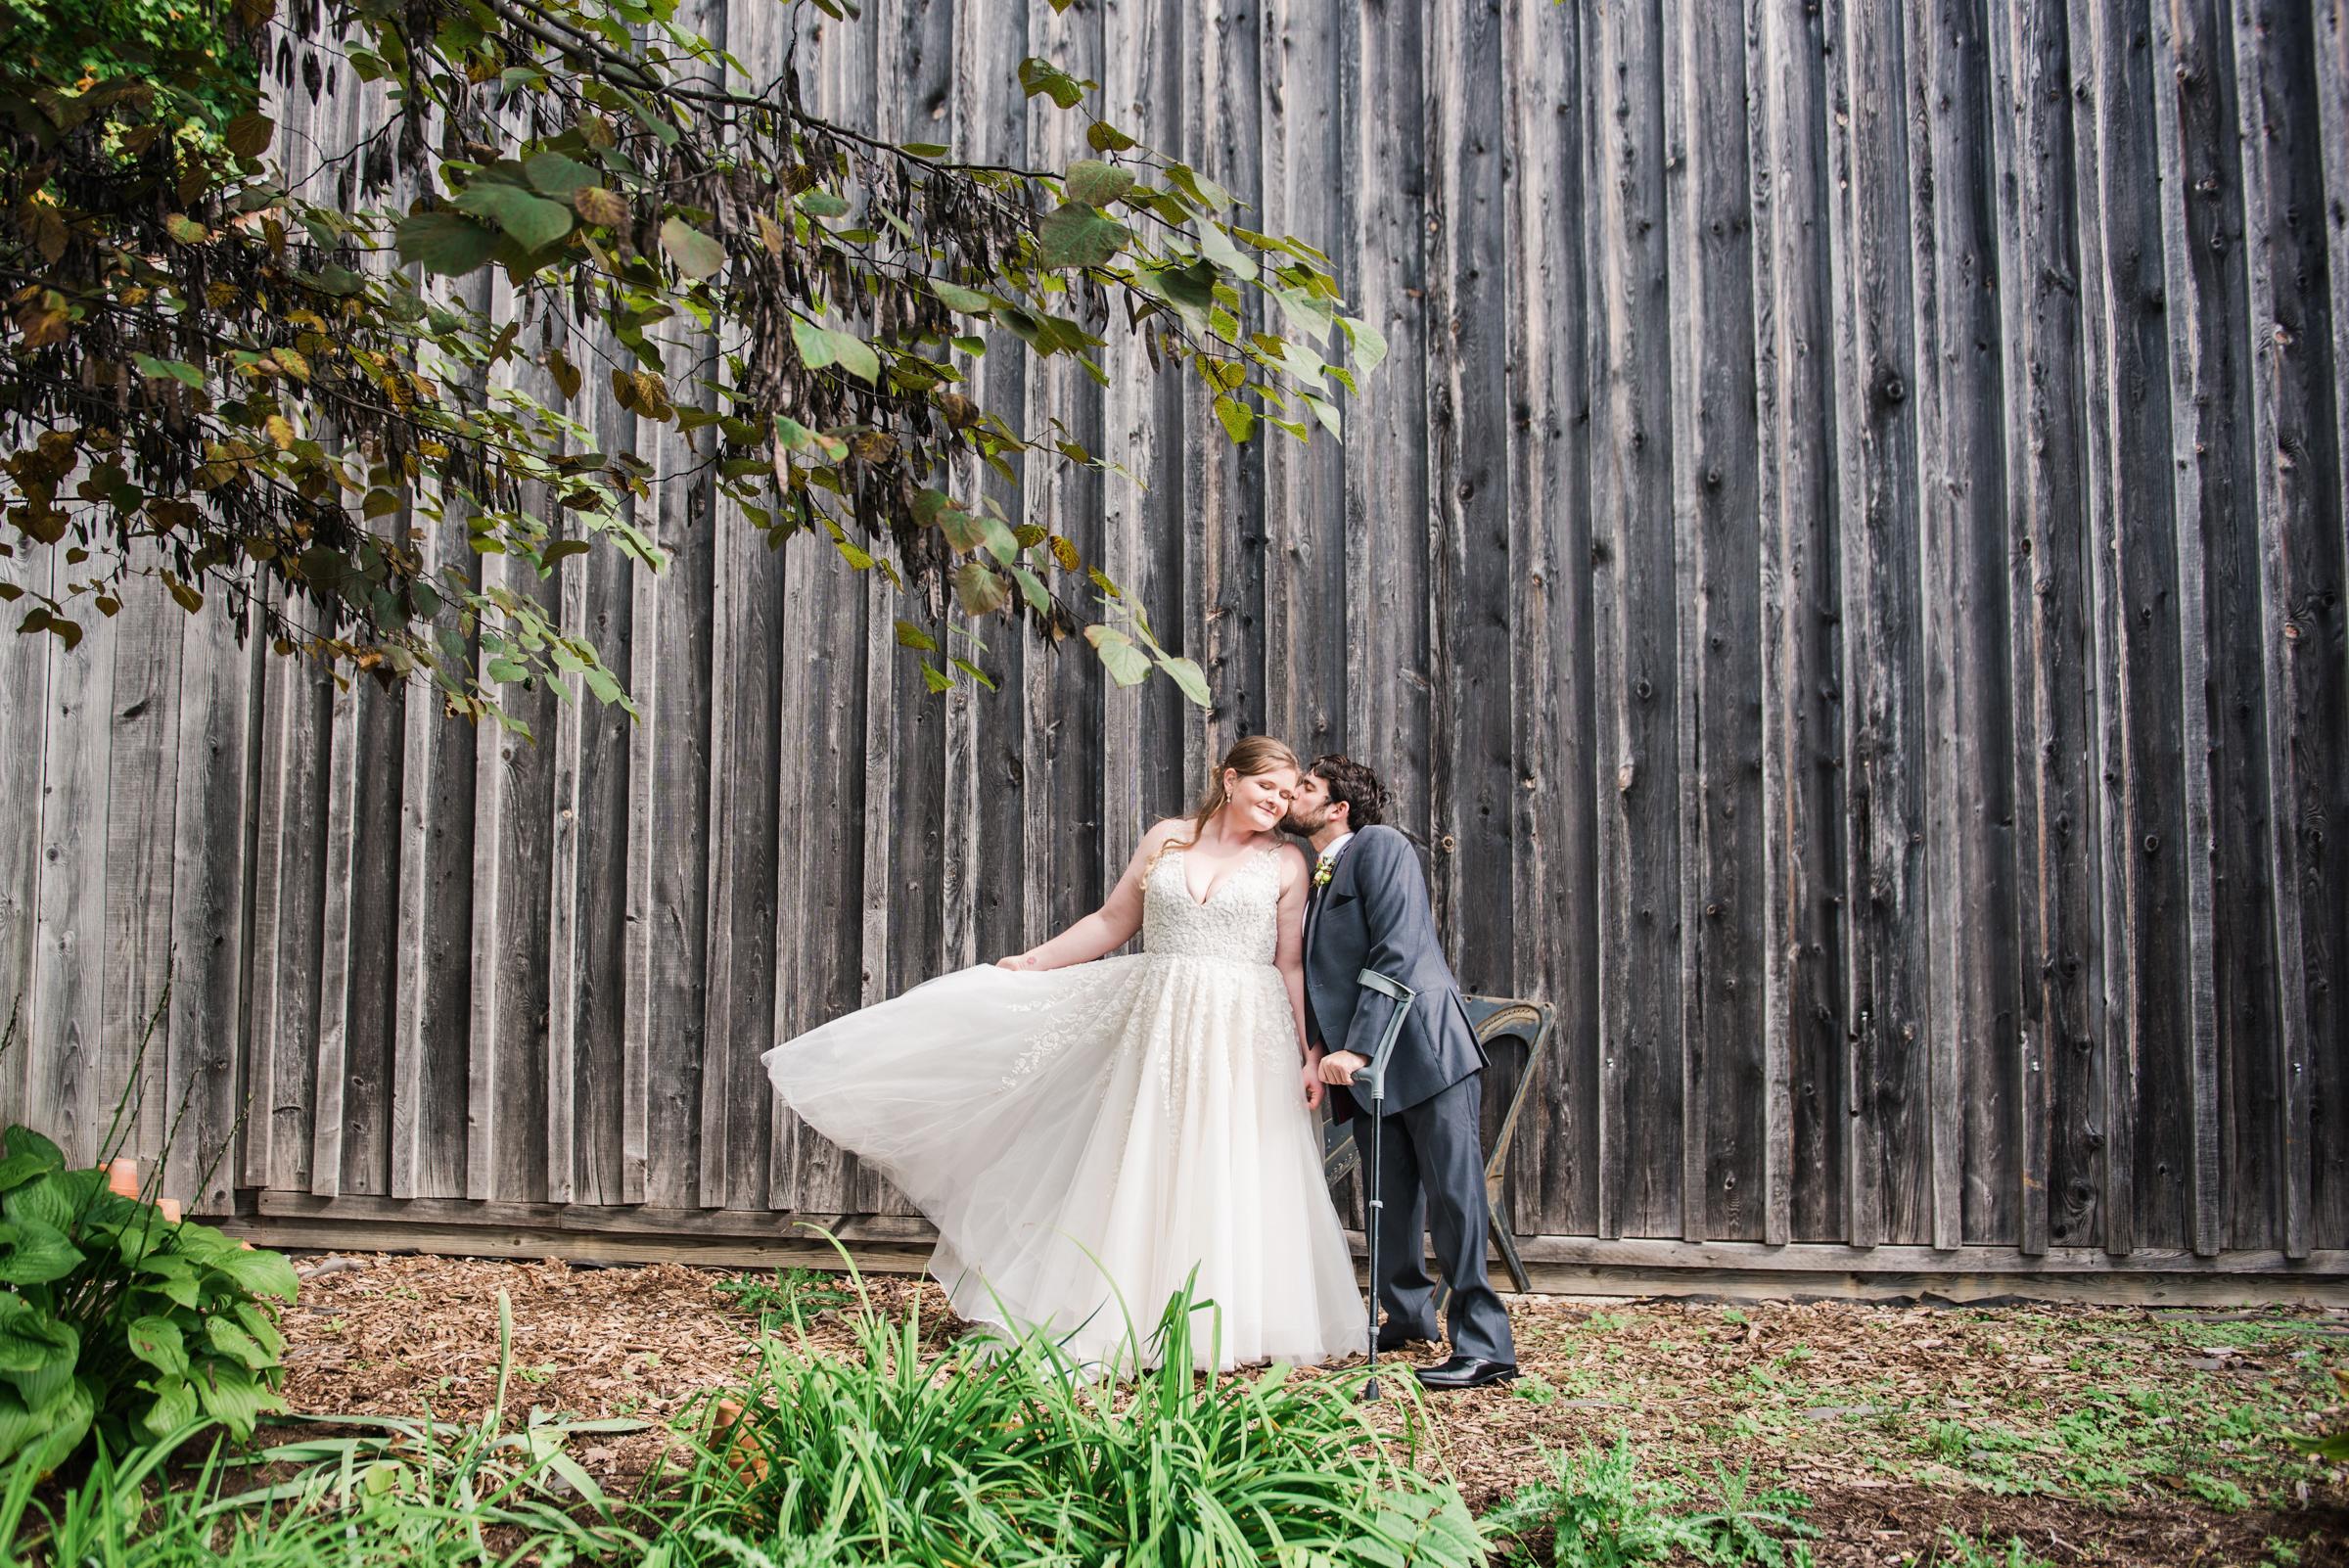 Zugibe_Vineyards_Finger_Lakes_Wedding_JILL_STUDIO_Rochester_NY_Photographer_DSC_3576.jpg